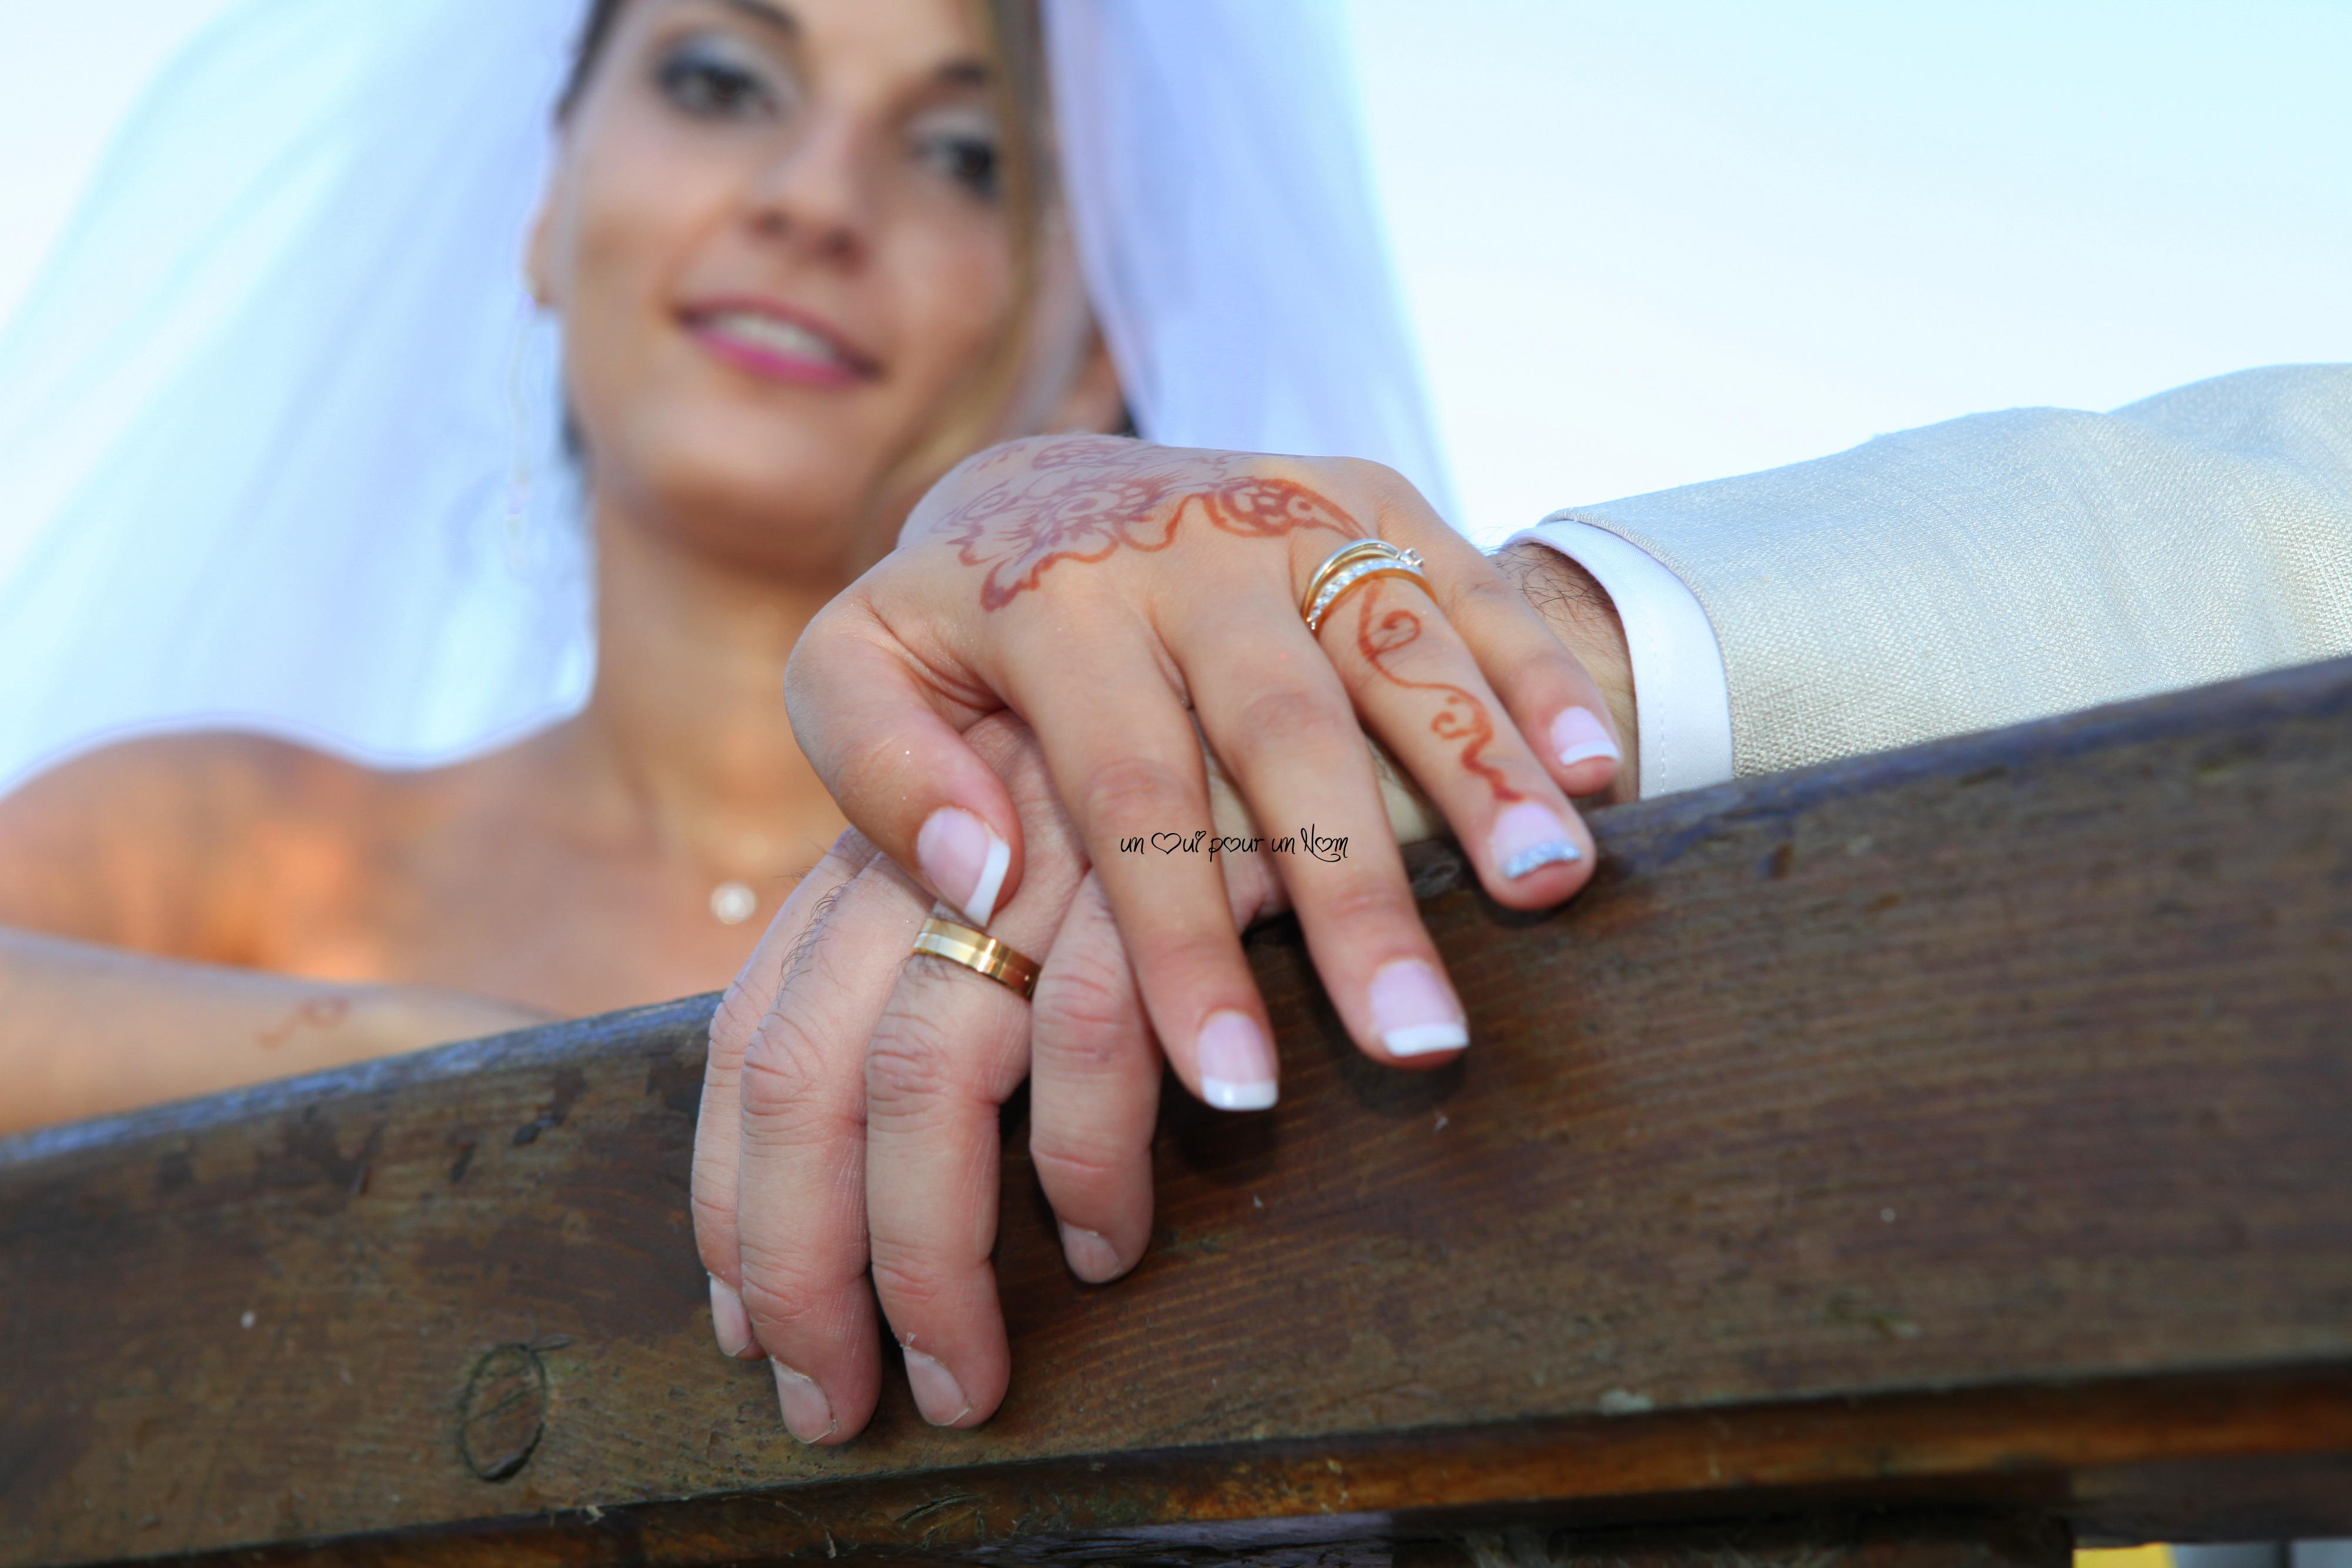 photographe cameraman montpellier mariage - Cameraman Mariage Montpellier